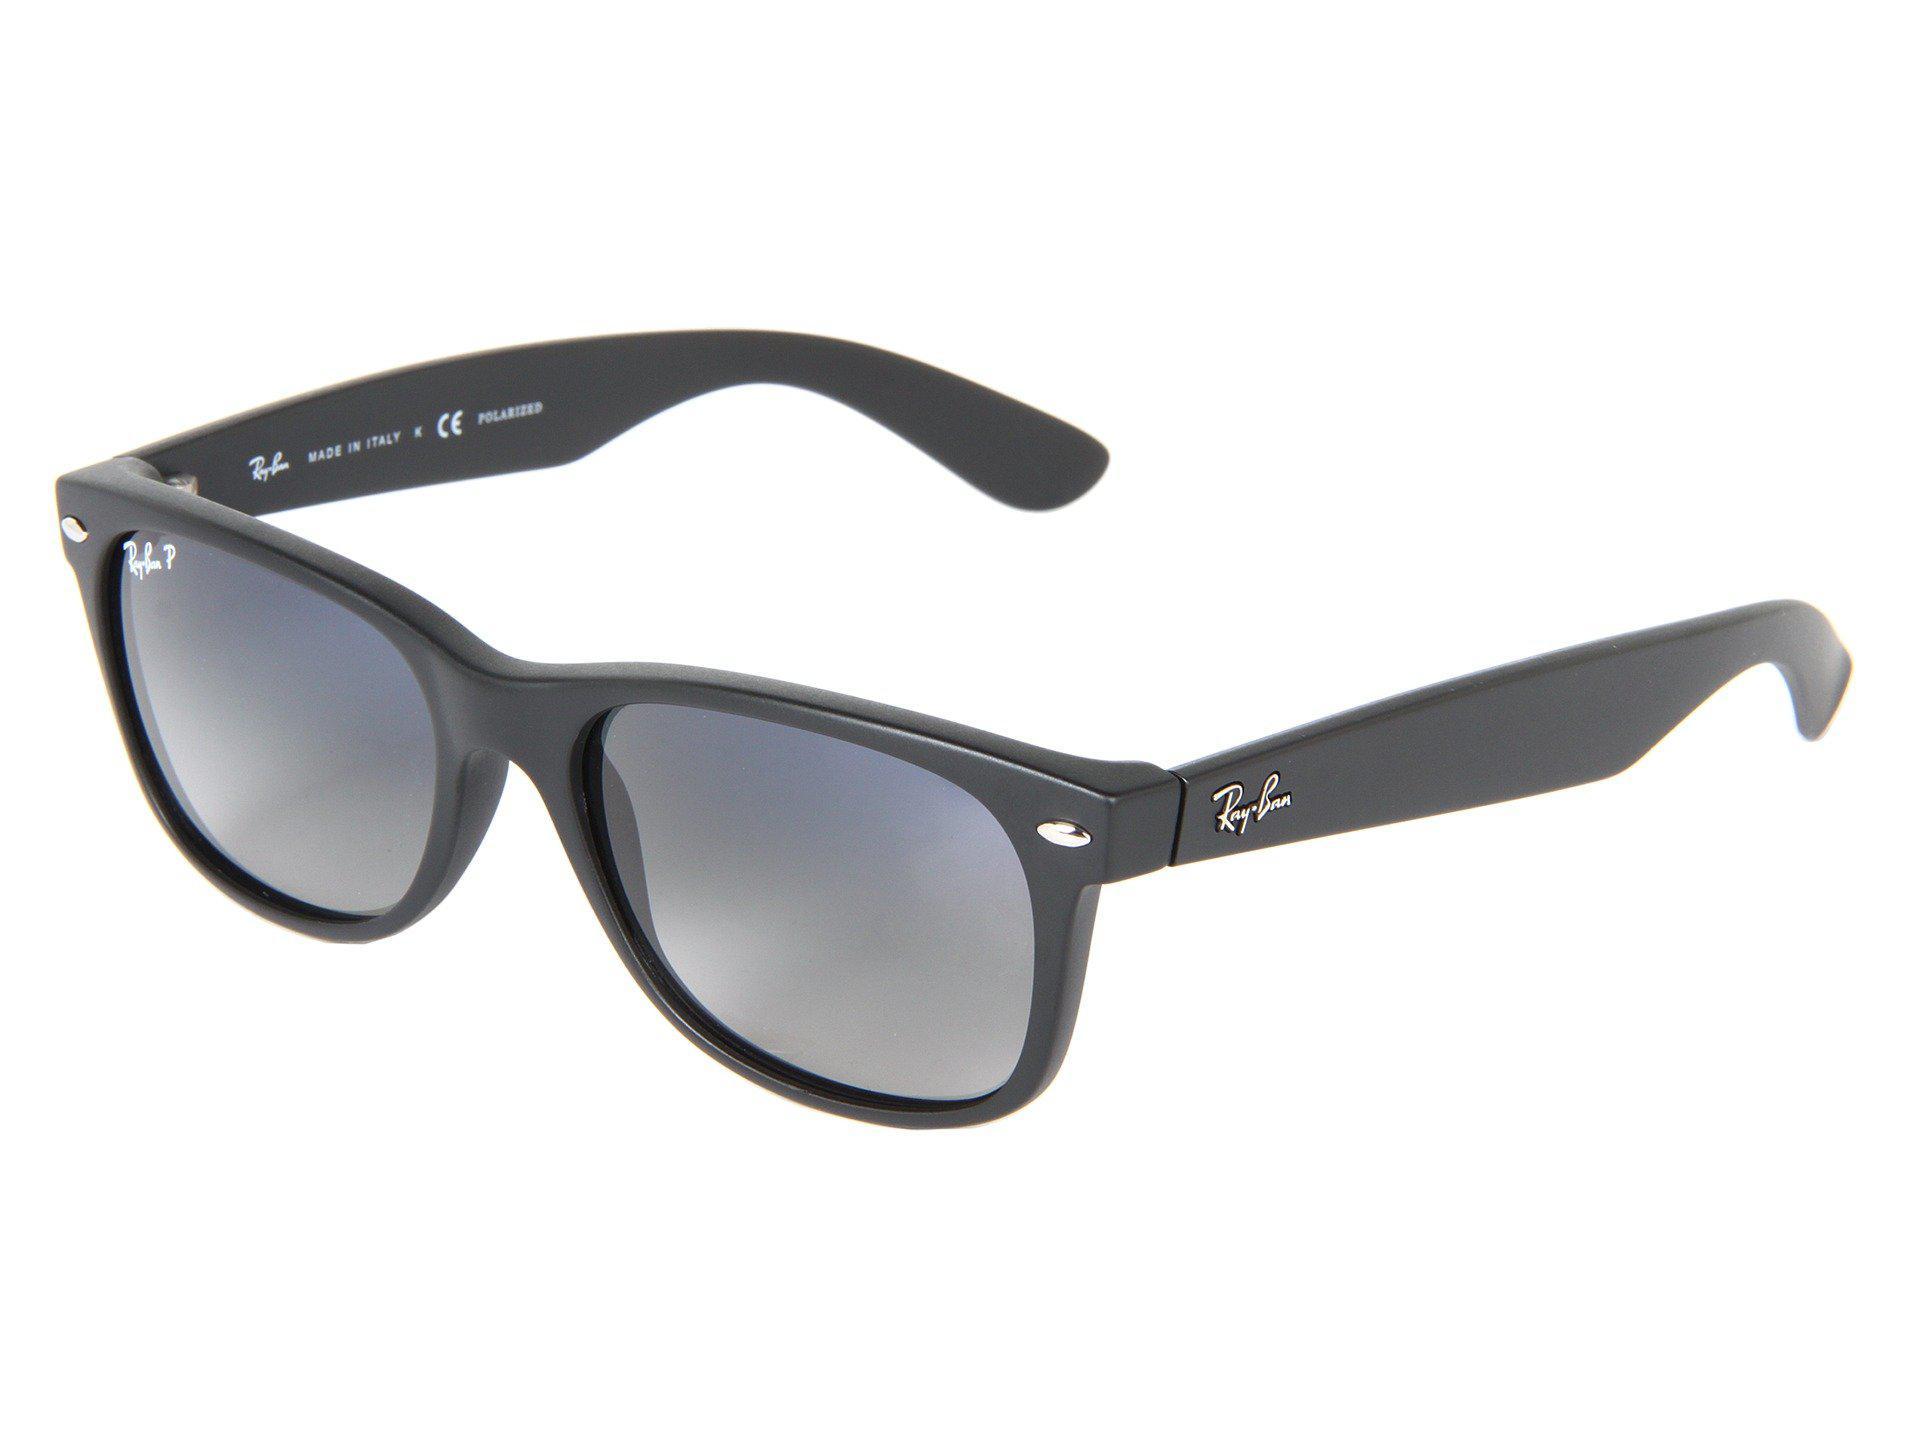 4aec14a87f8 Ray-Ban. Women s Black Rb2132 New Wayfarer Polarized 55mm (tortoise crystal Green  Polarized Lens) Fashion Sunglasses